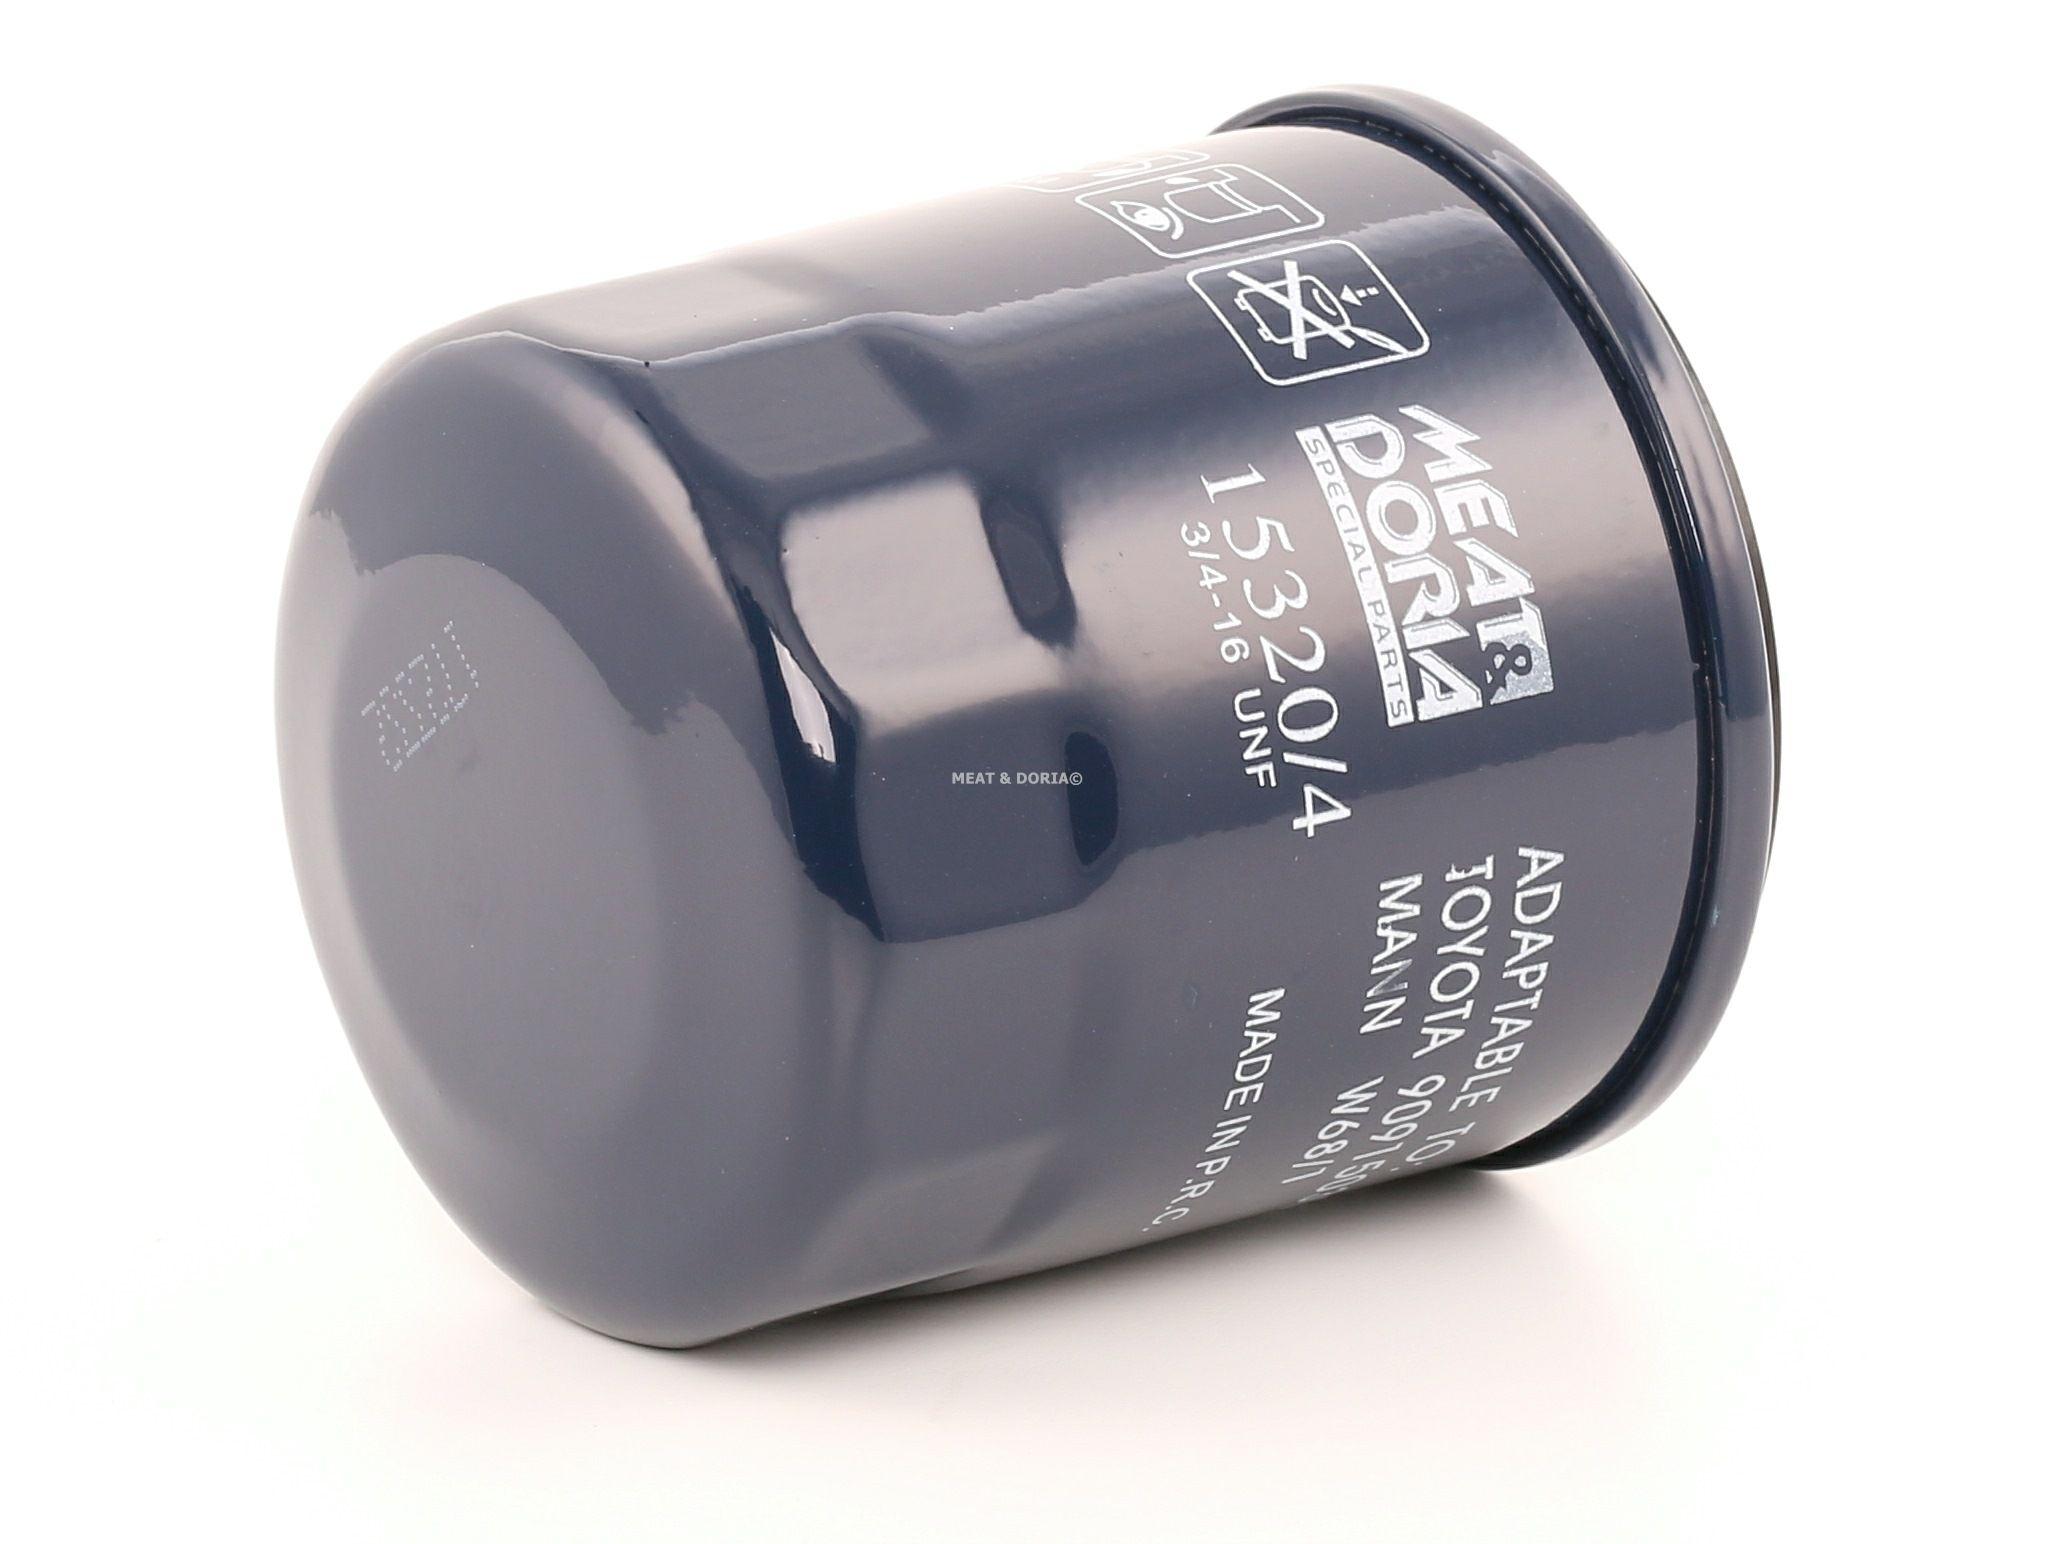 Filter MEAT & DORIA 15320/4 Bewertung